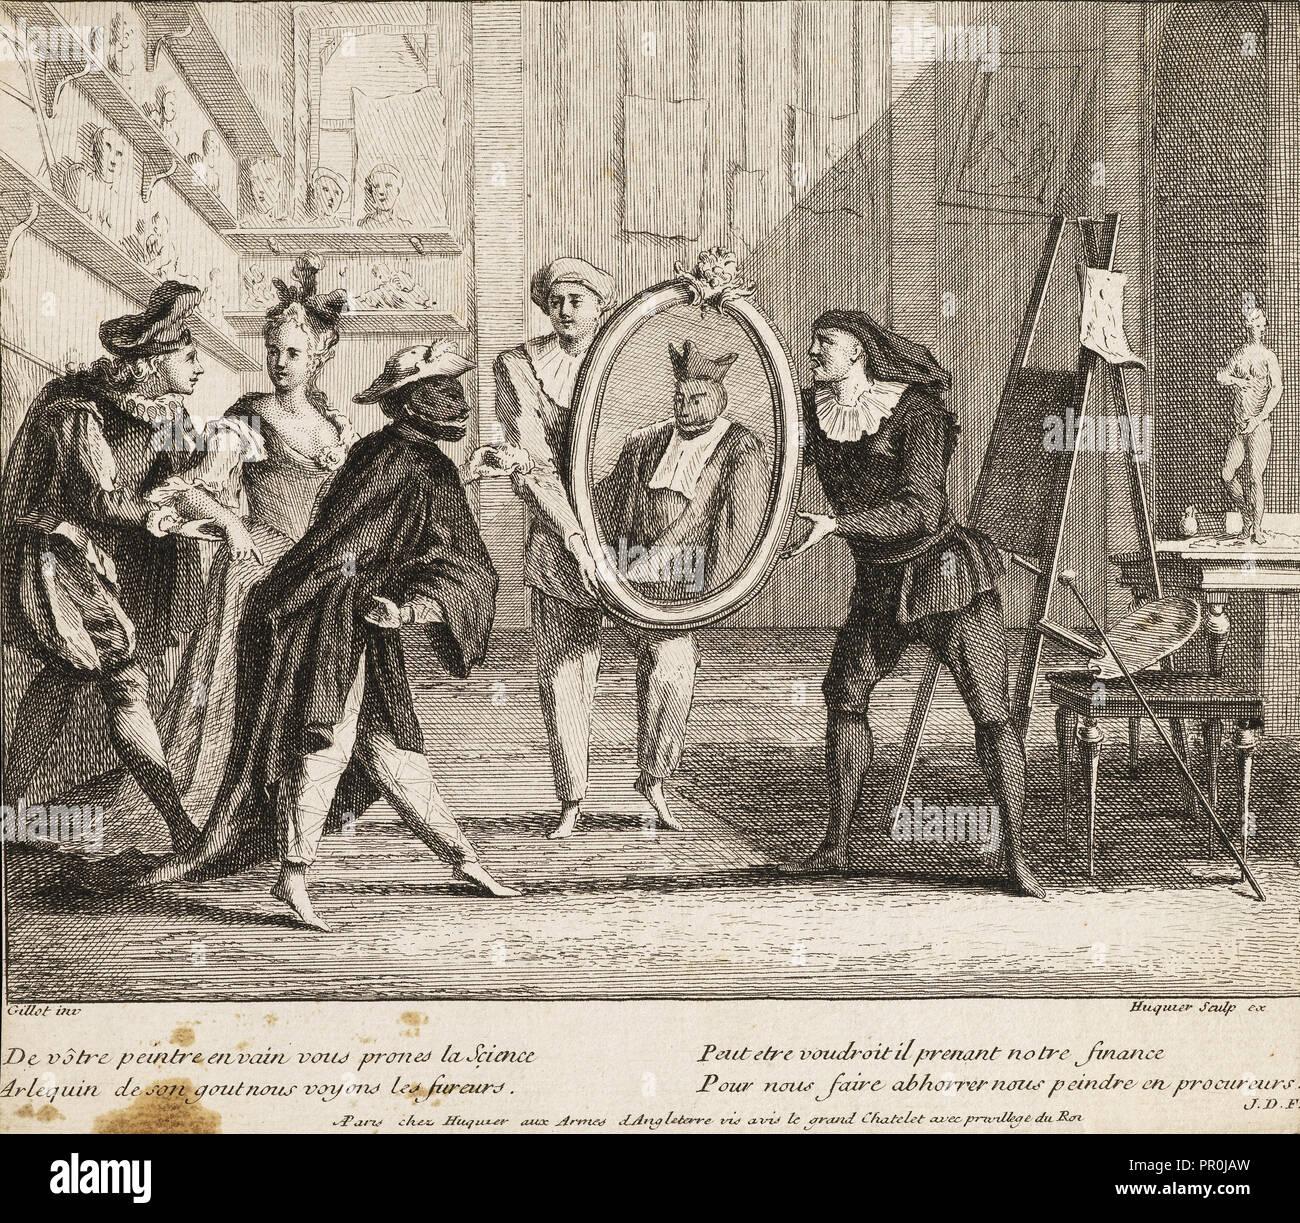 De vôtre peintre en vain, Italian theater prints, Gillot, Claude, 1673-1722, Huquier, Gabriel, 1695-1772, Etching, ca. 1729 - Stock Image